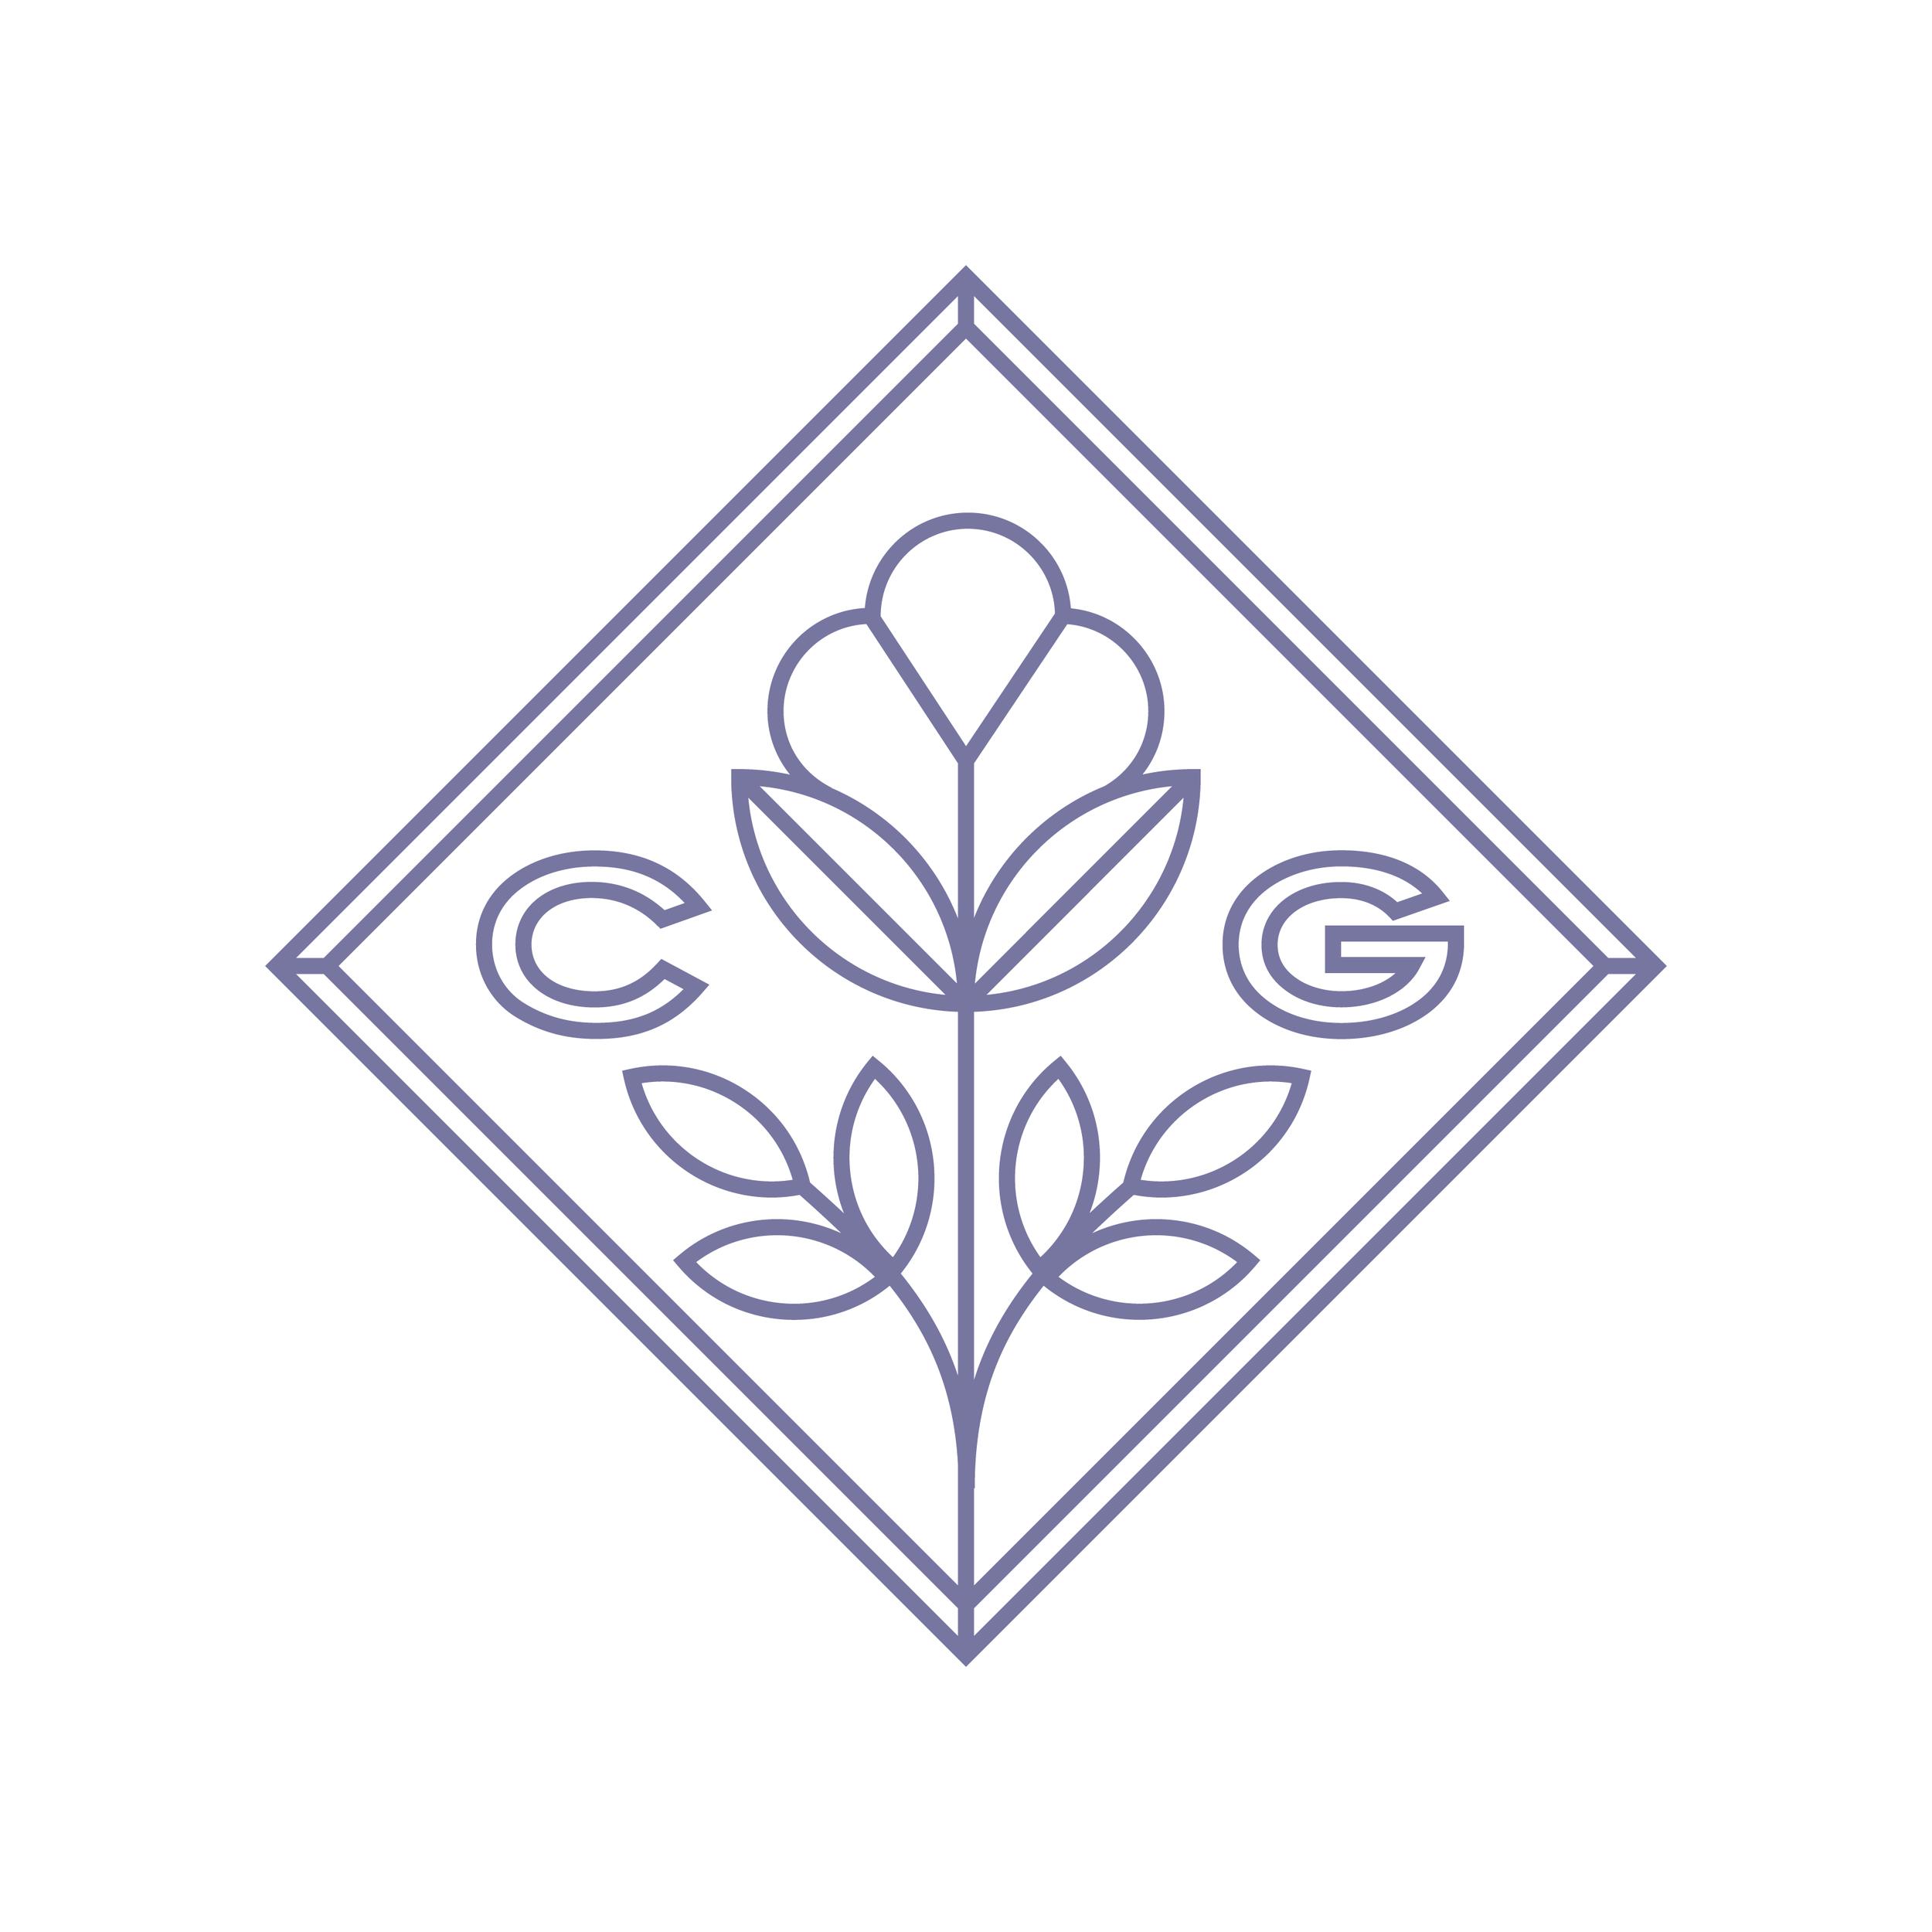 CommonFolk_Website_Identities_01-17.png